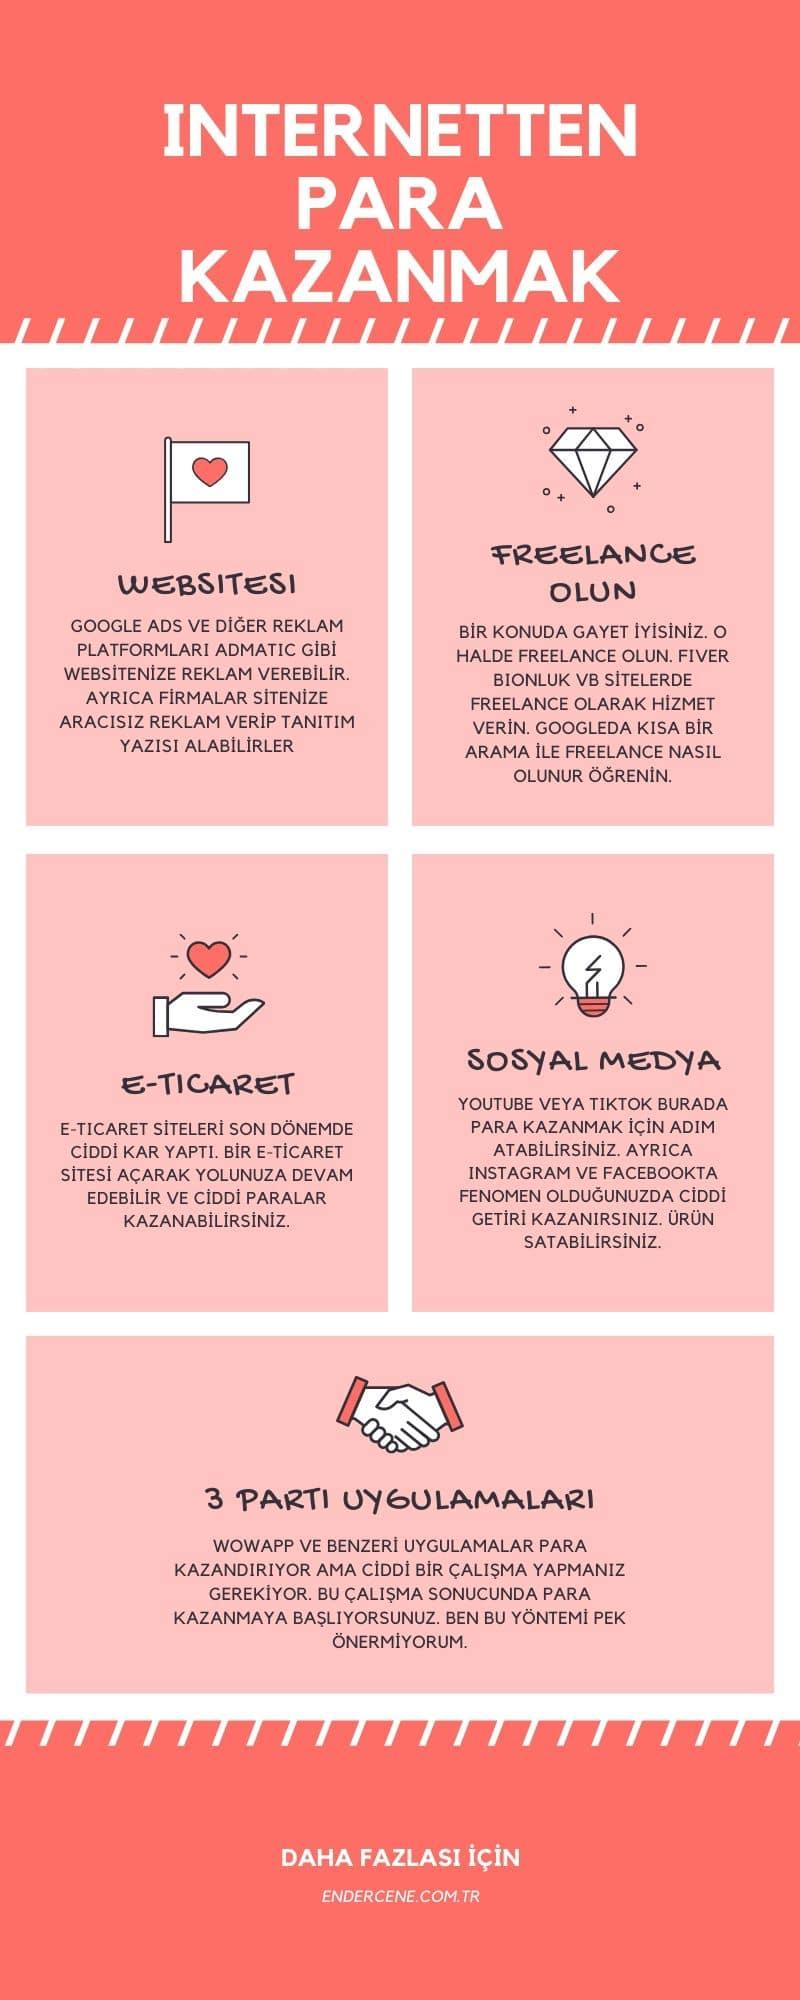 internetten para kazanma infografik